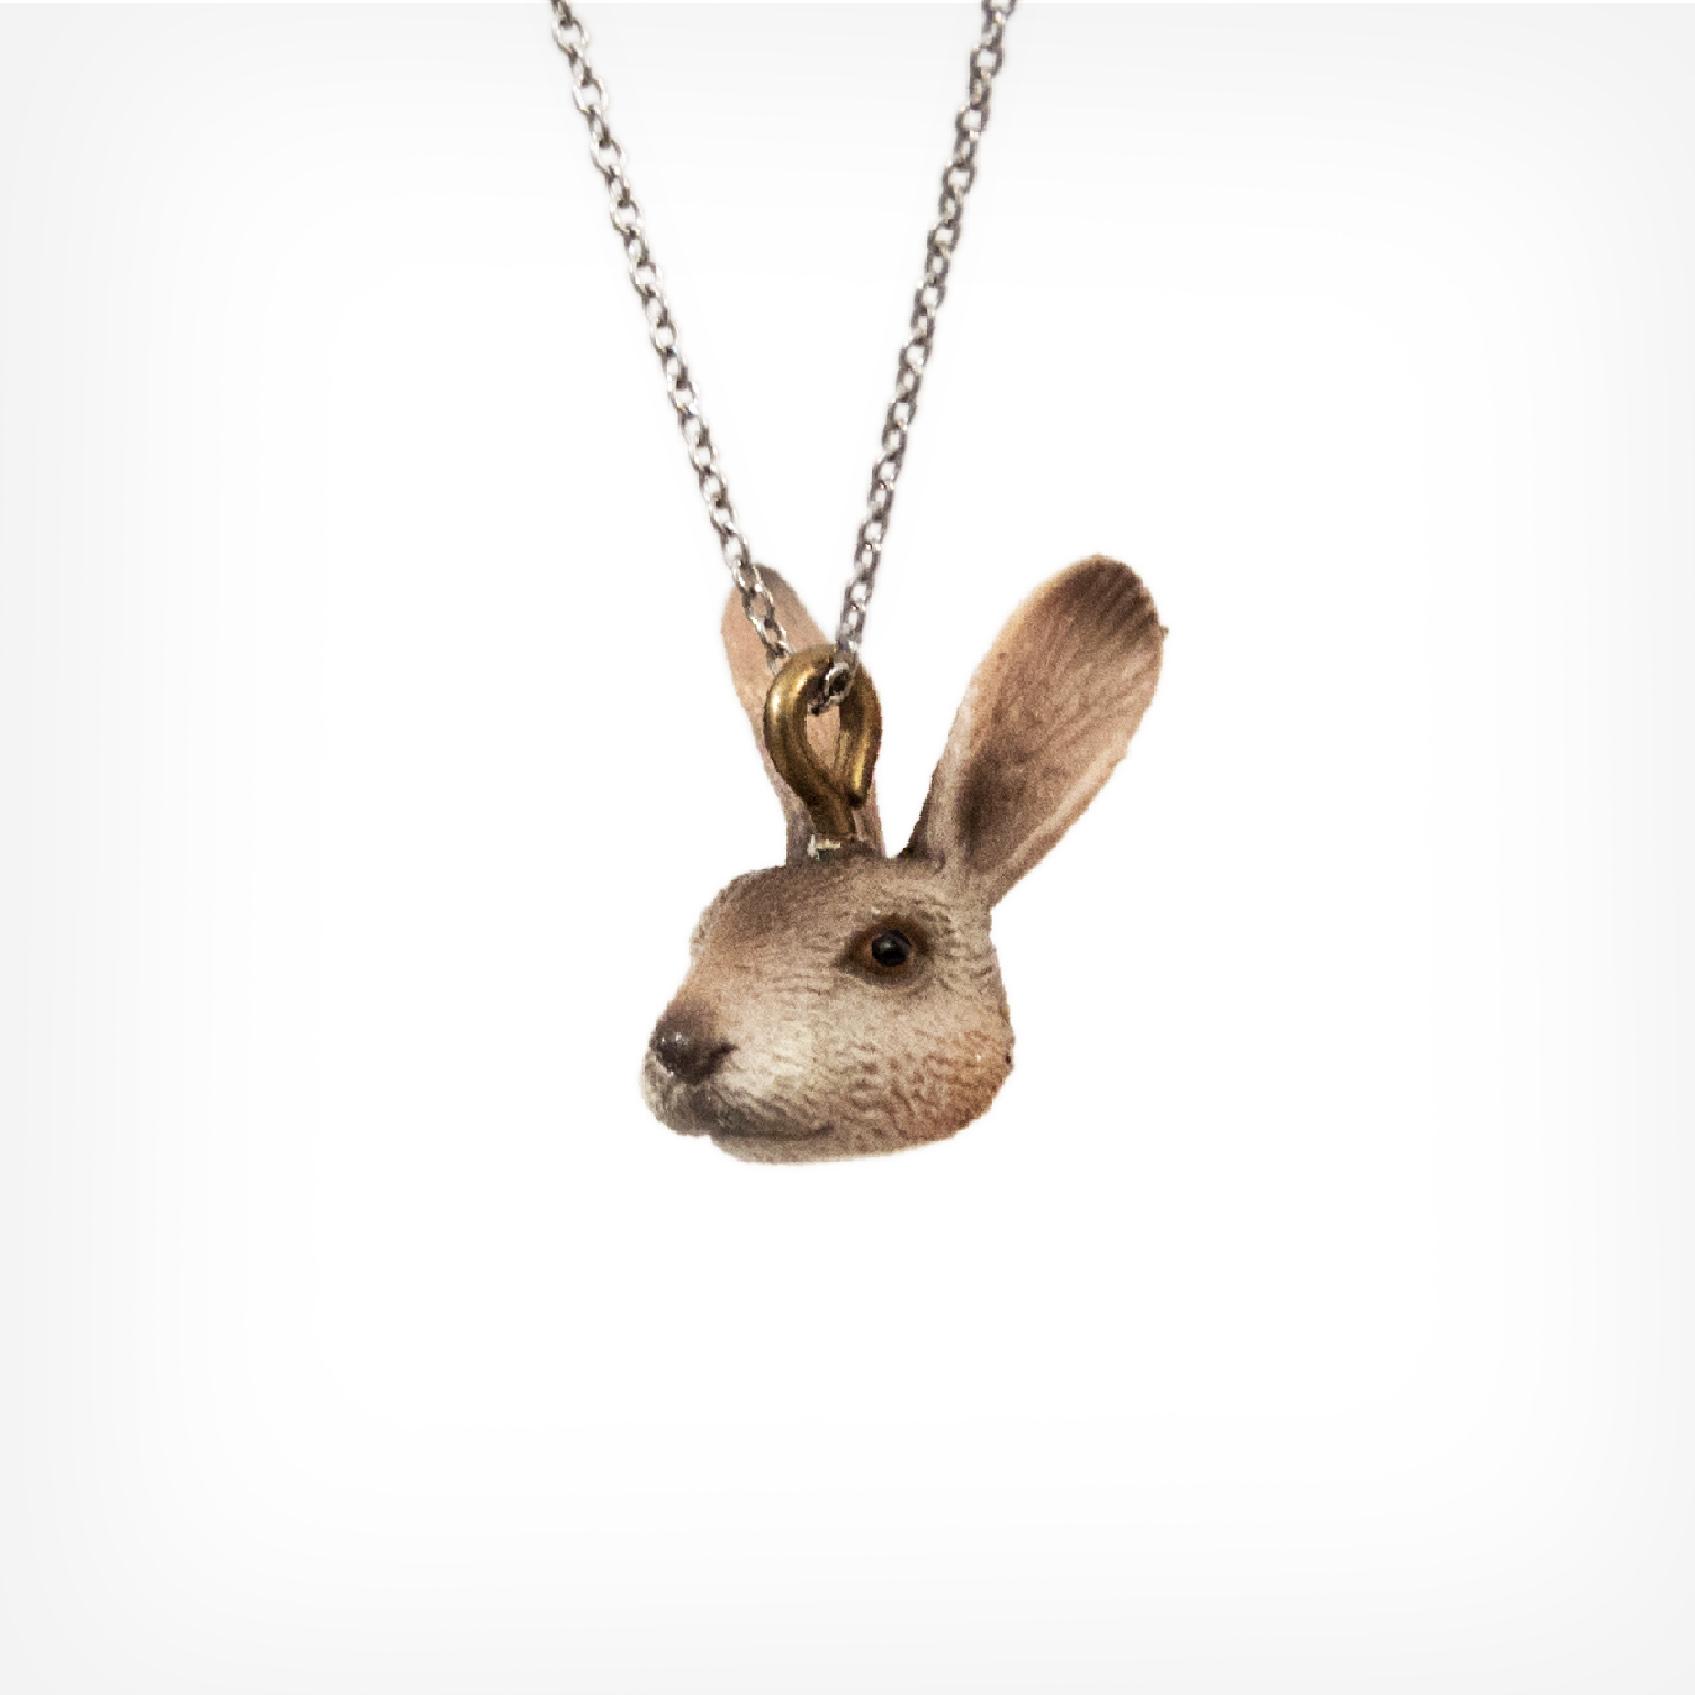 Feldhase | hare